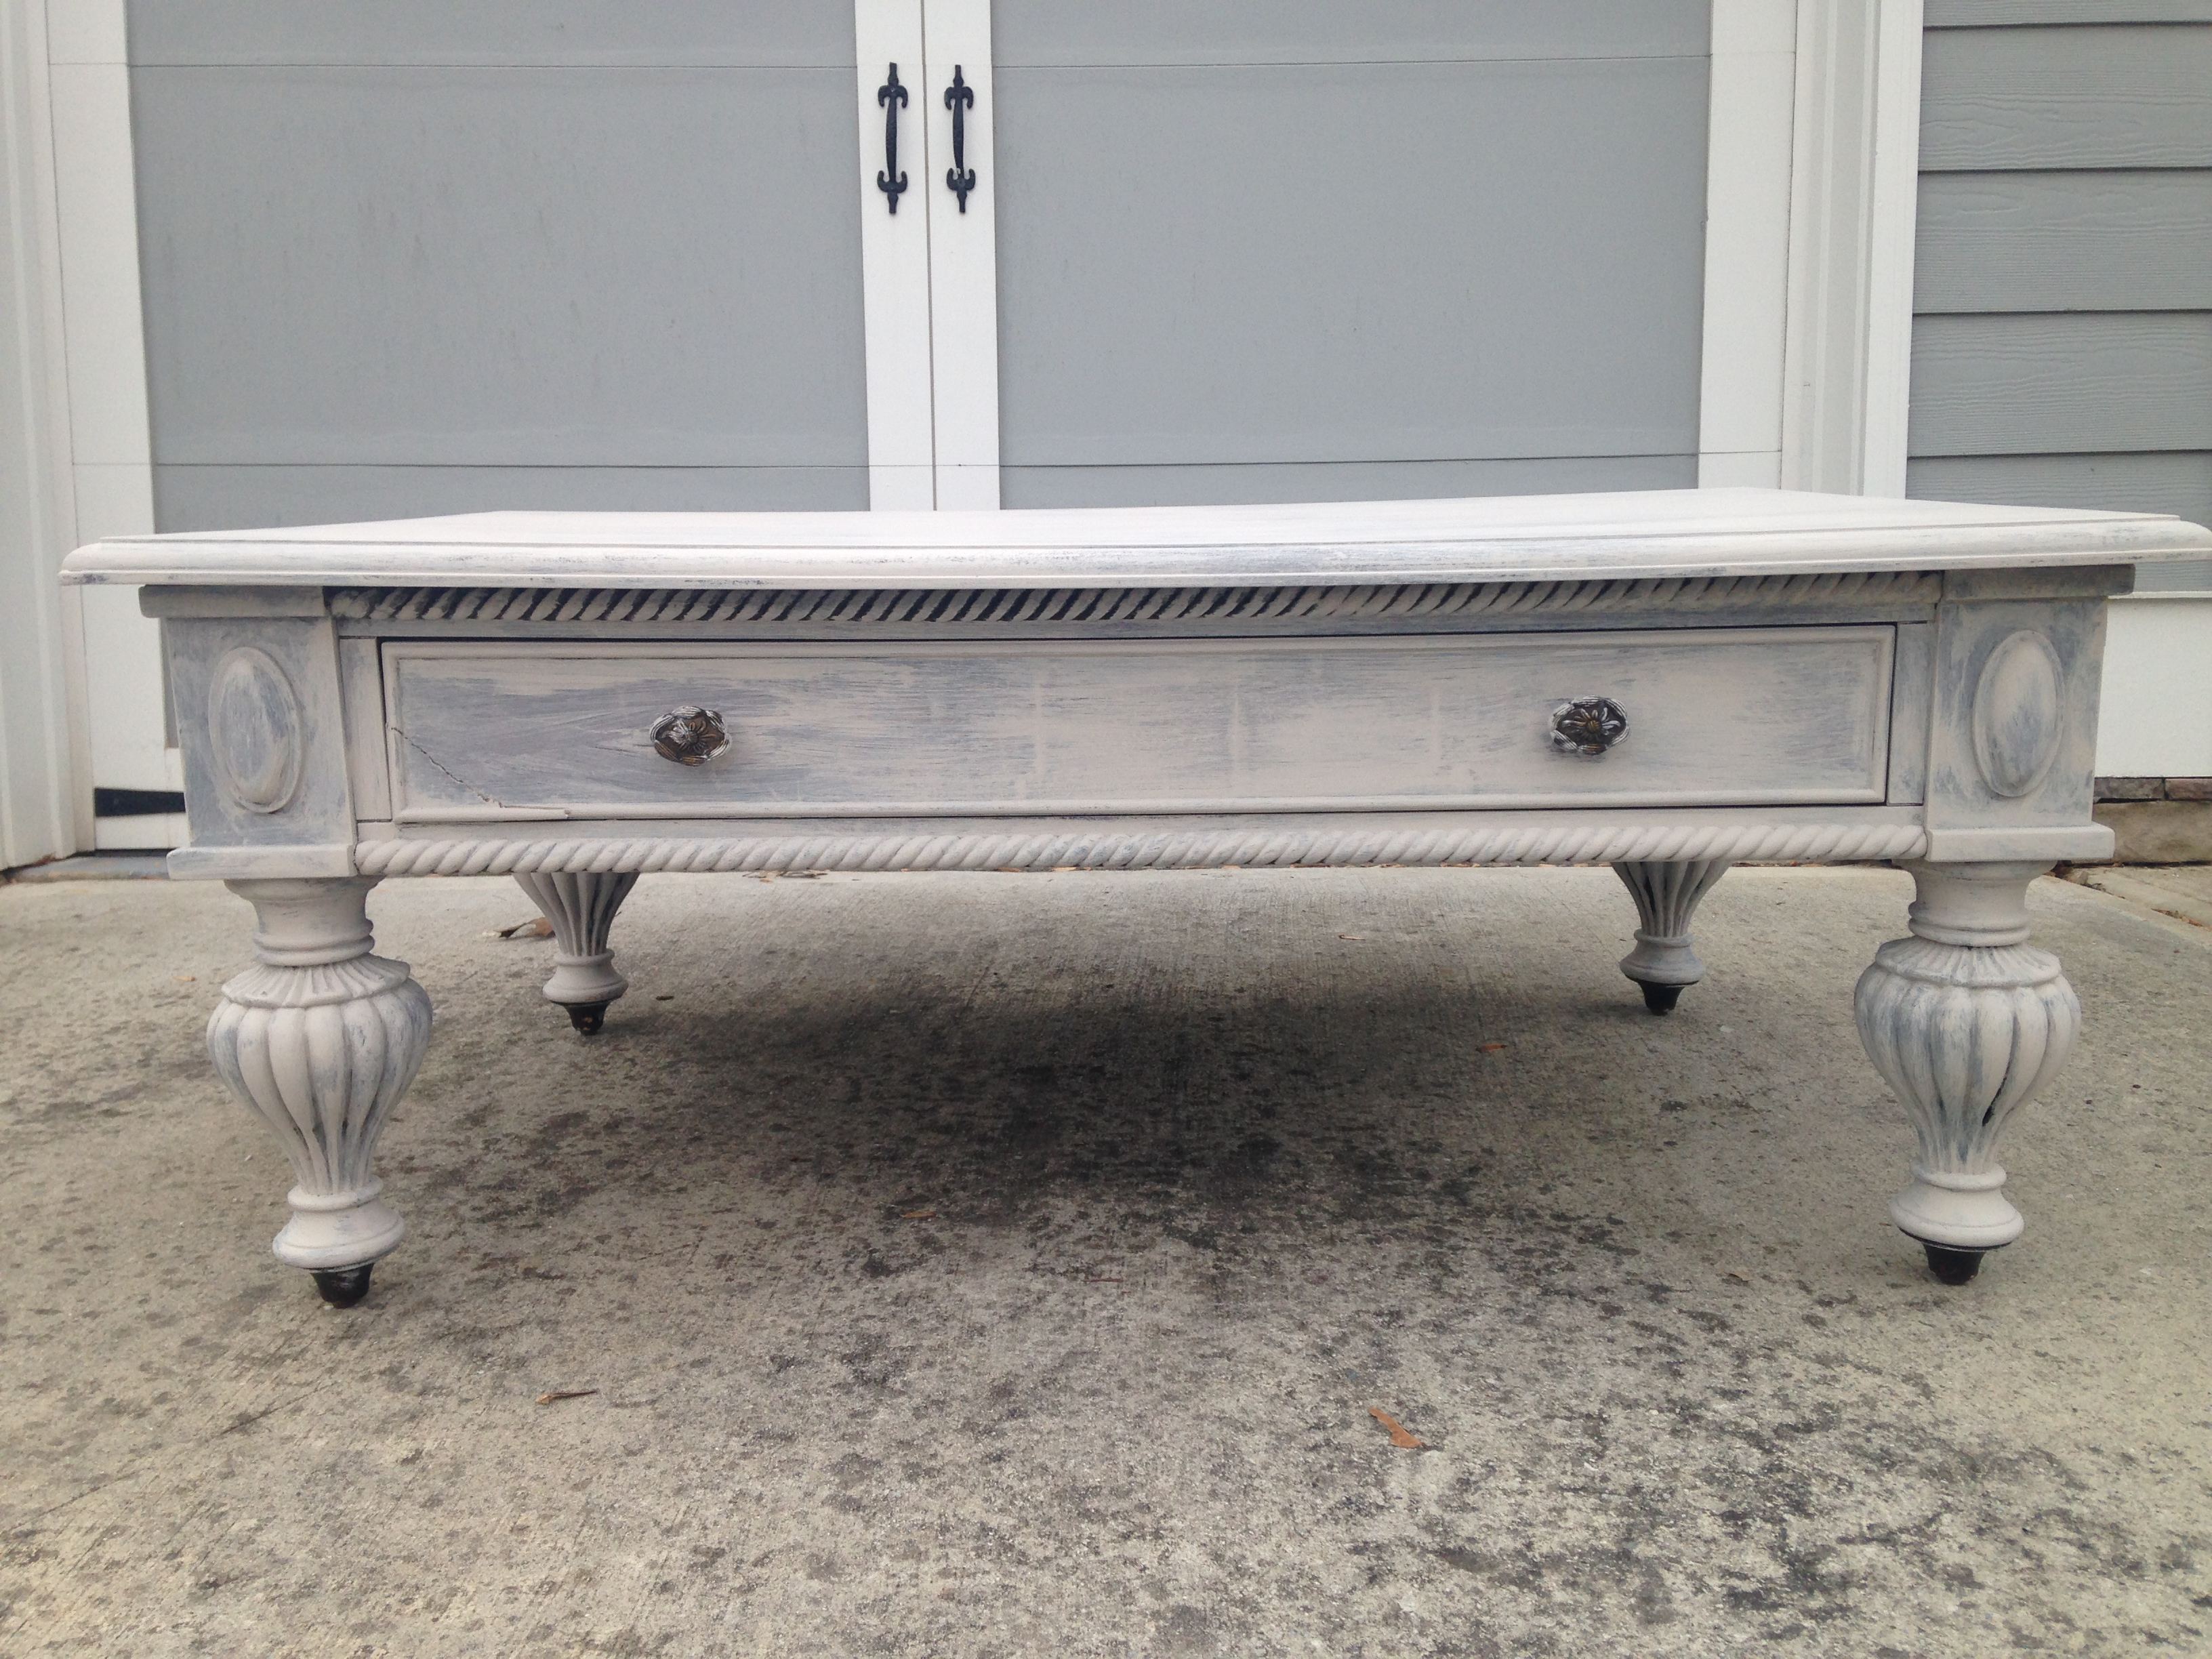 Chalk Paint - Furniture Makeover - Crockpot Empire - Kim Bishop